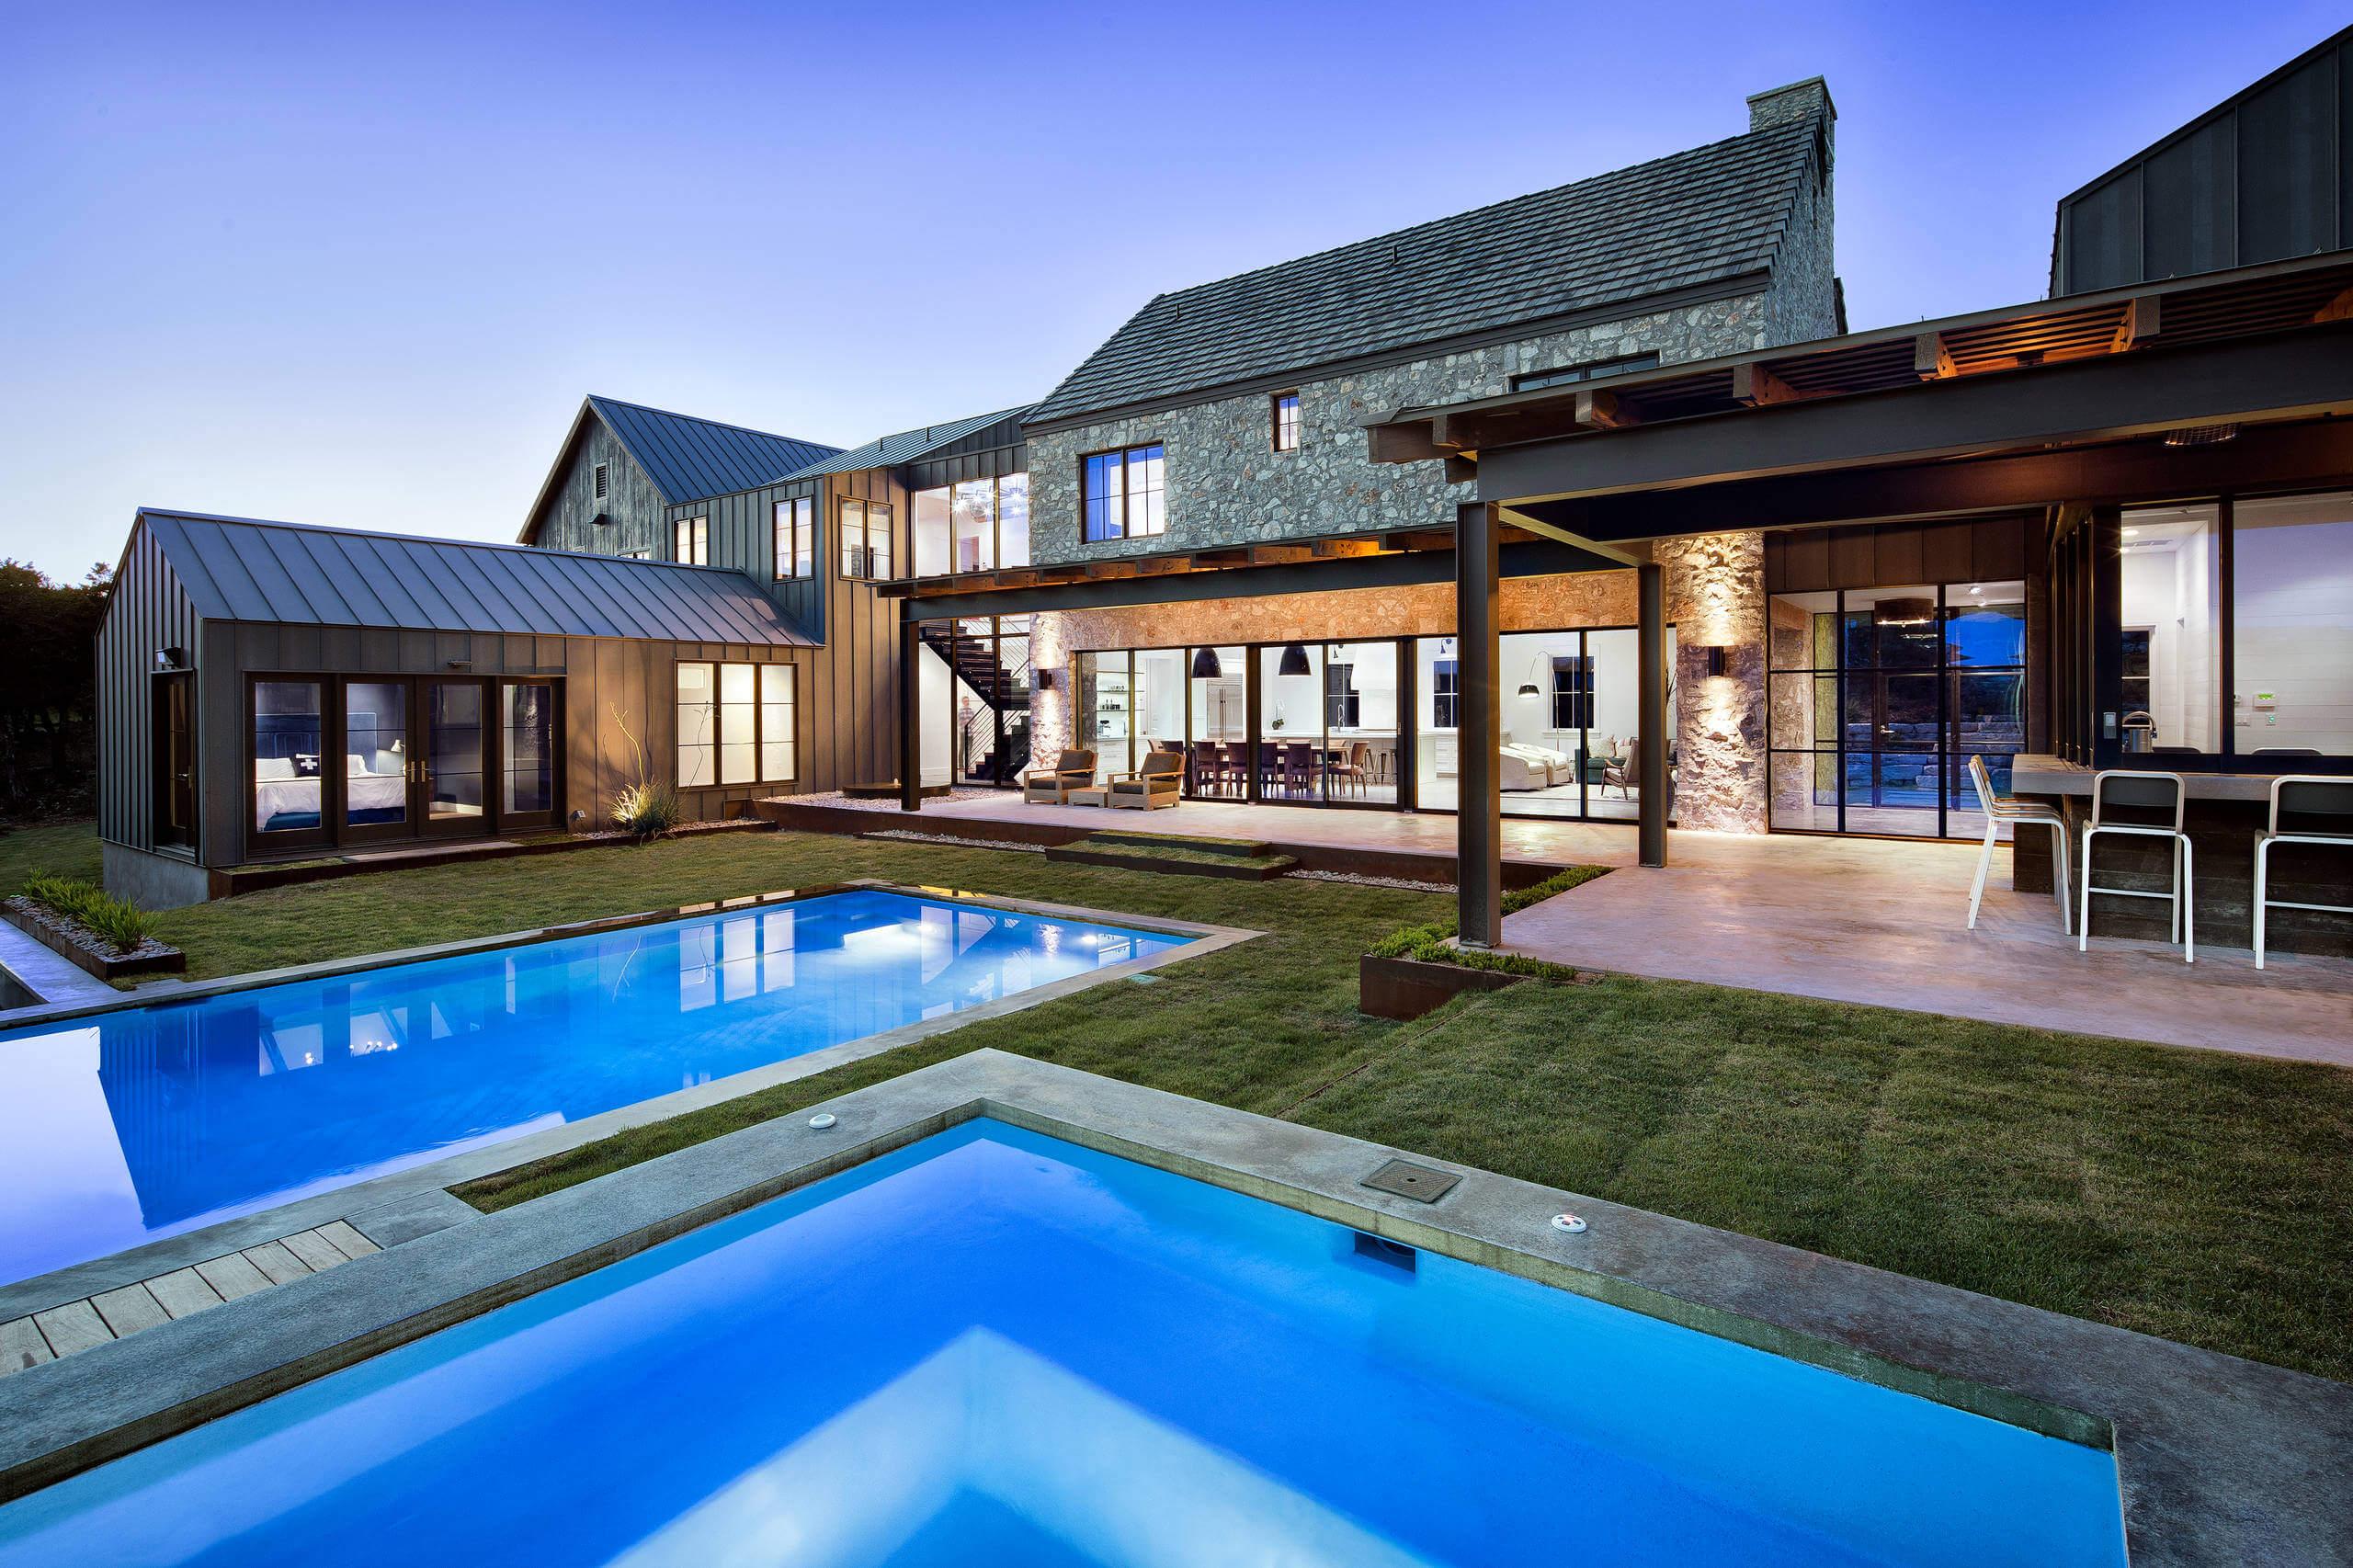 farmhouse-shiflet-group-architects-09